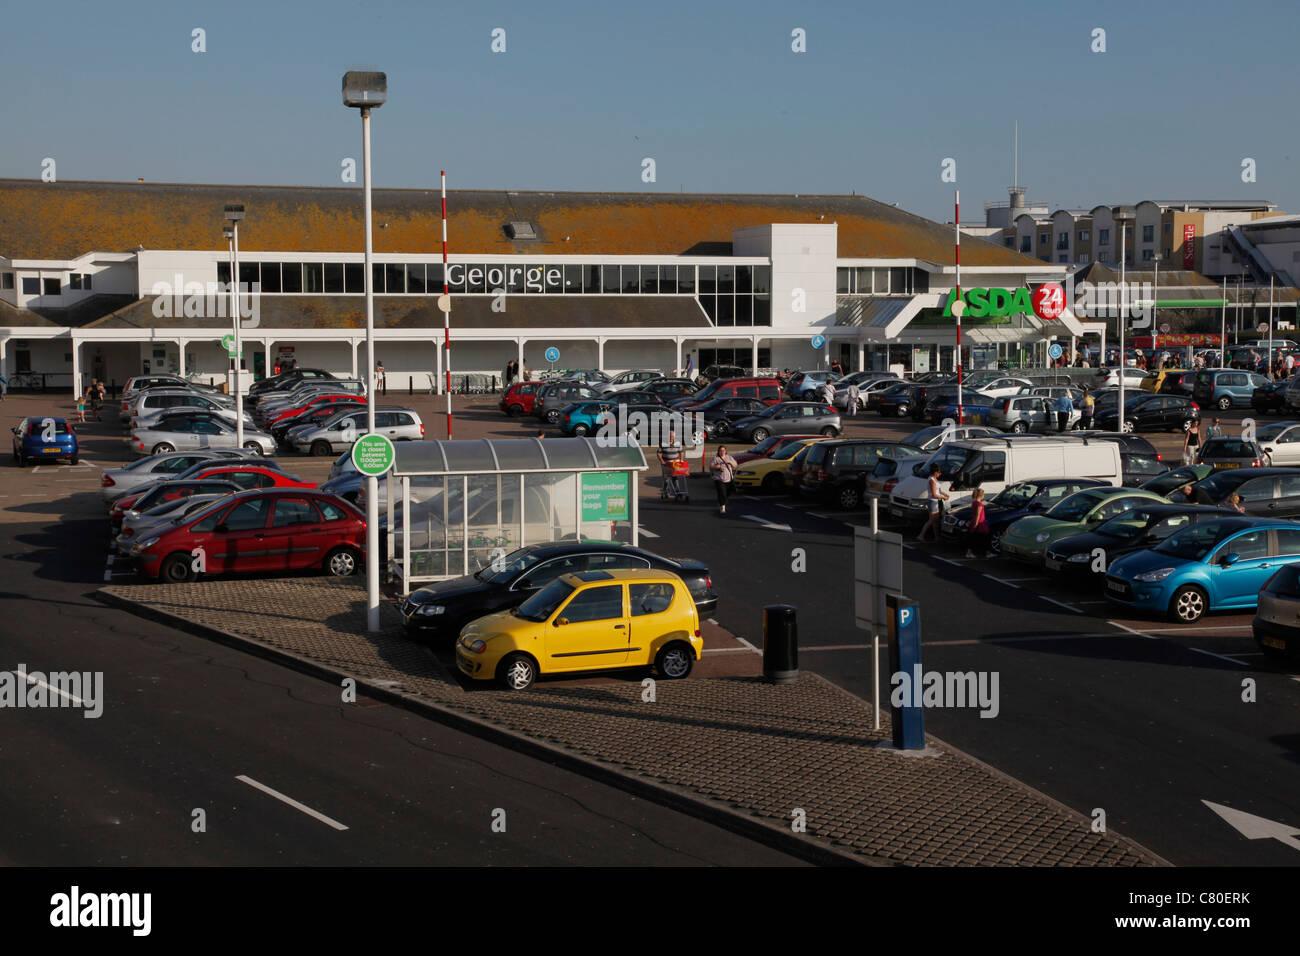 Sainsbury Brighton Car Park